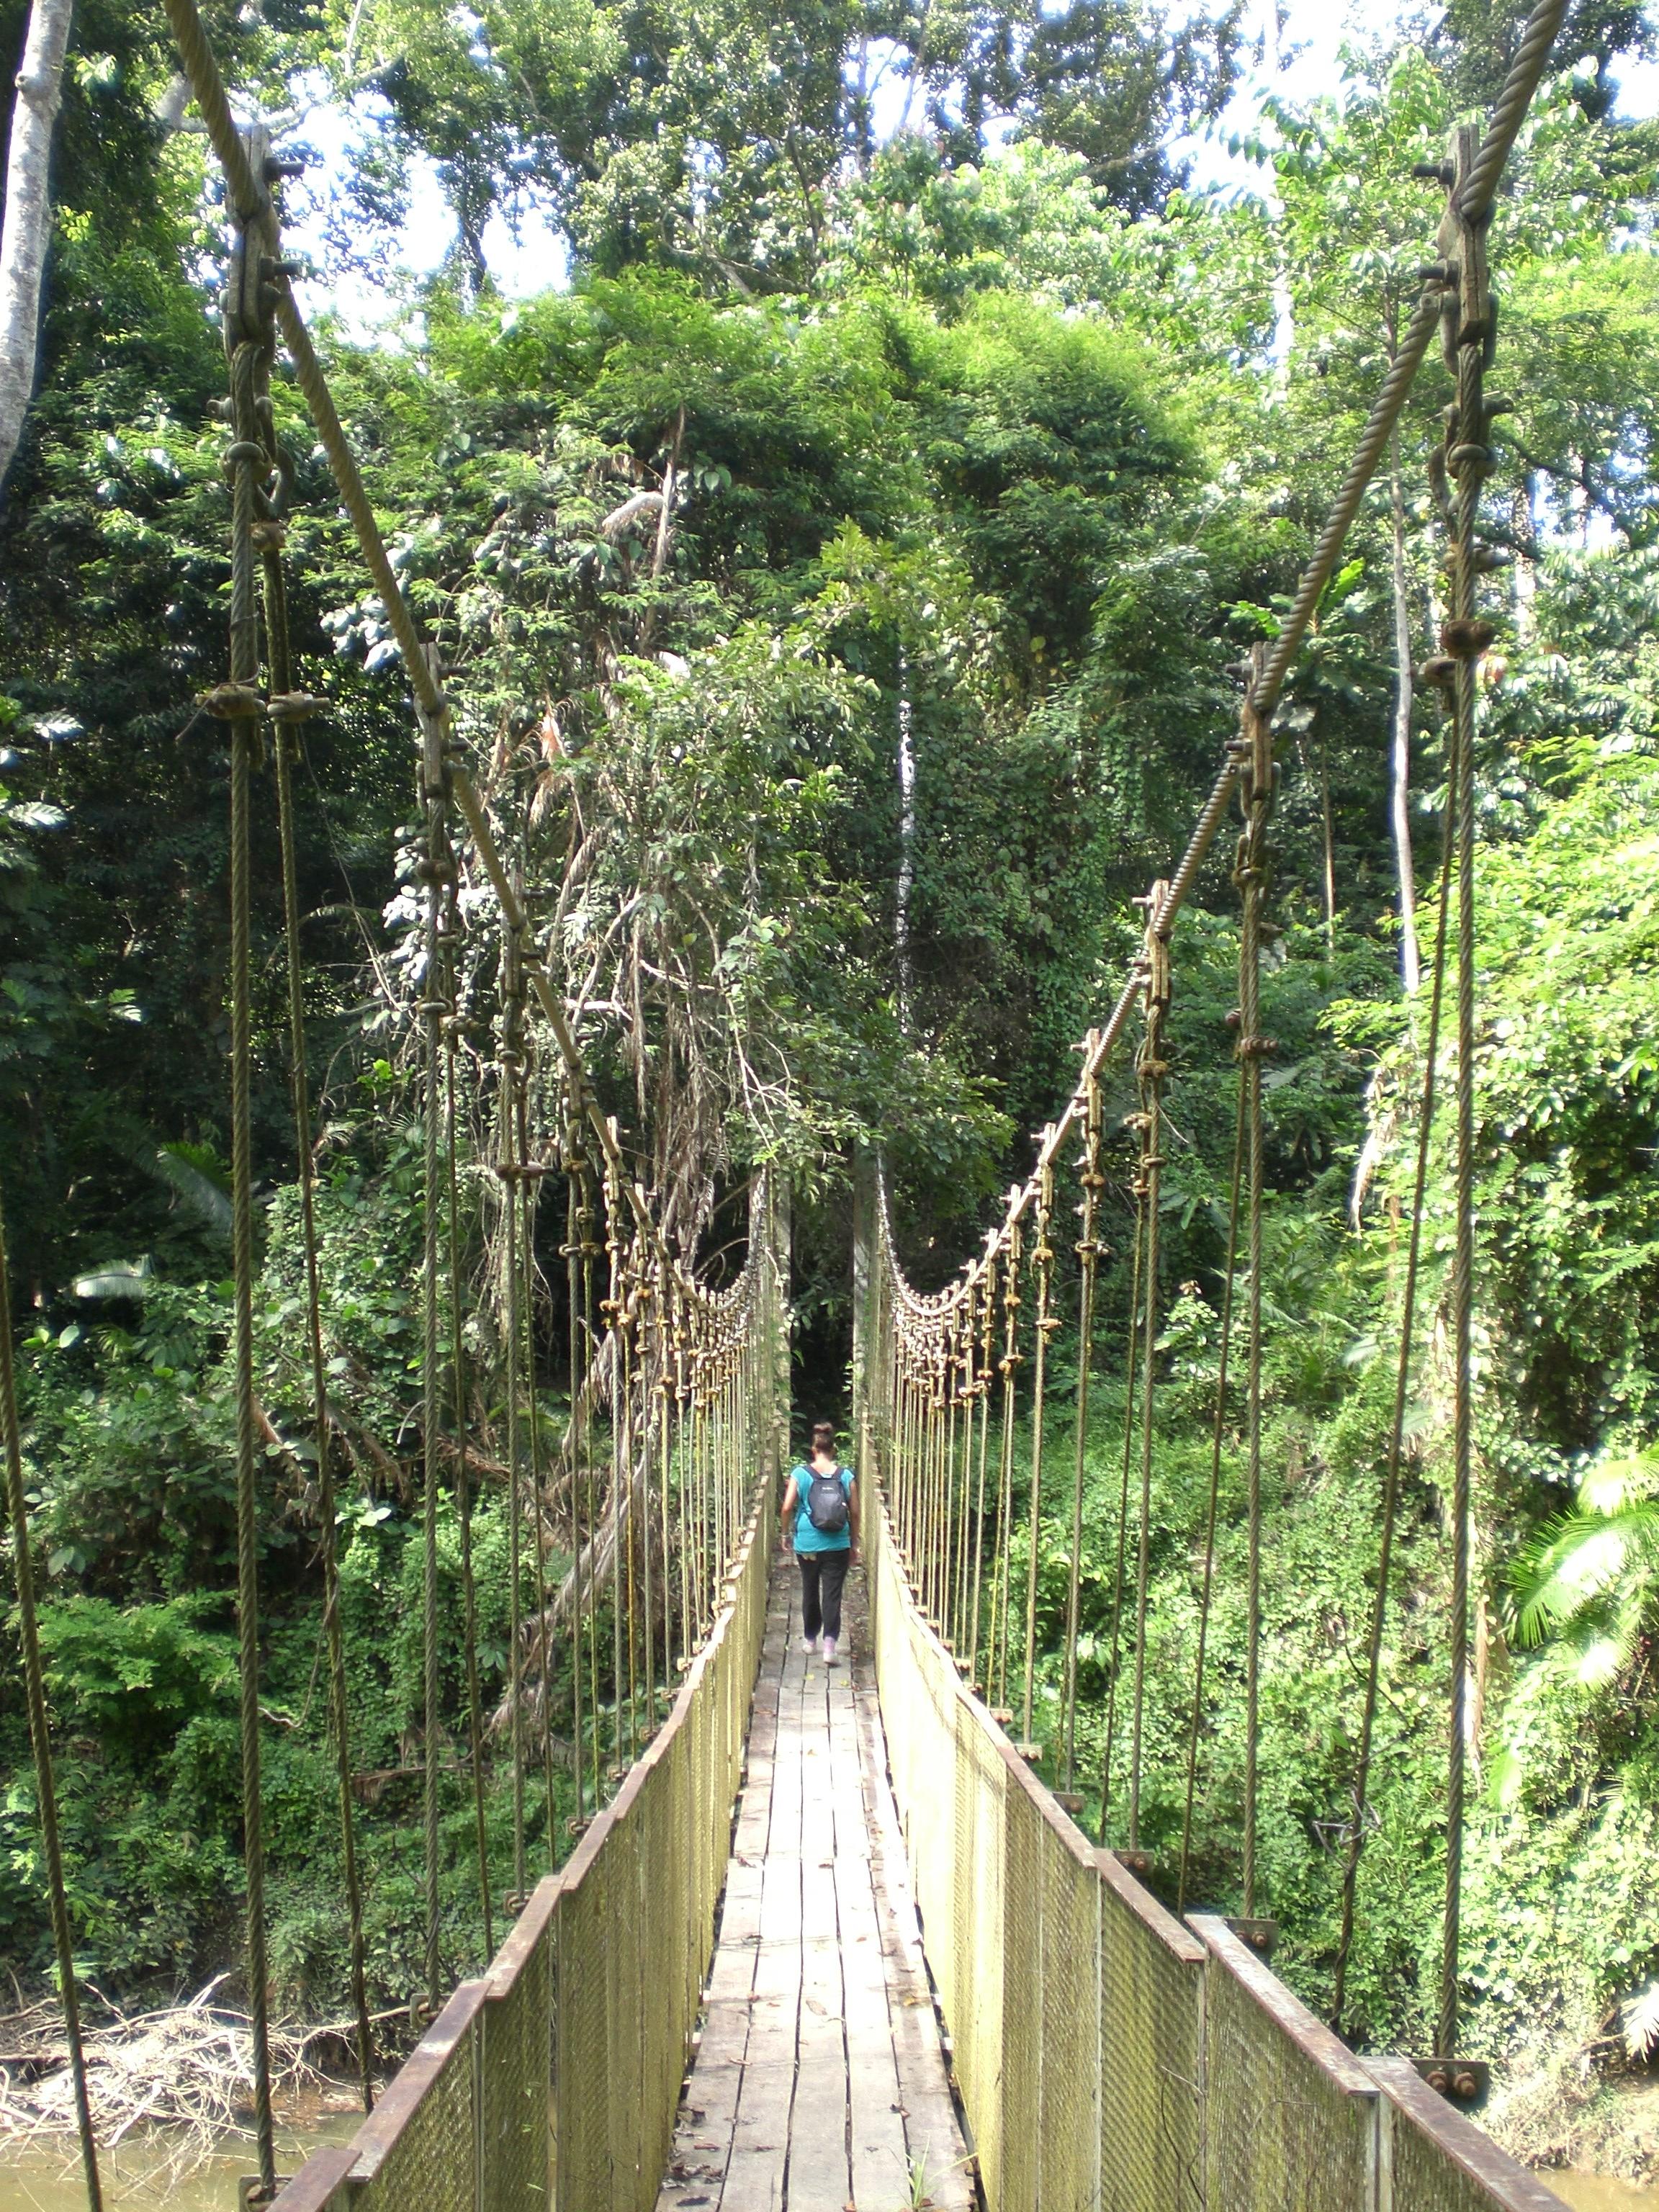 Taman Negara has the longest canopy walk in the world!